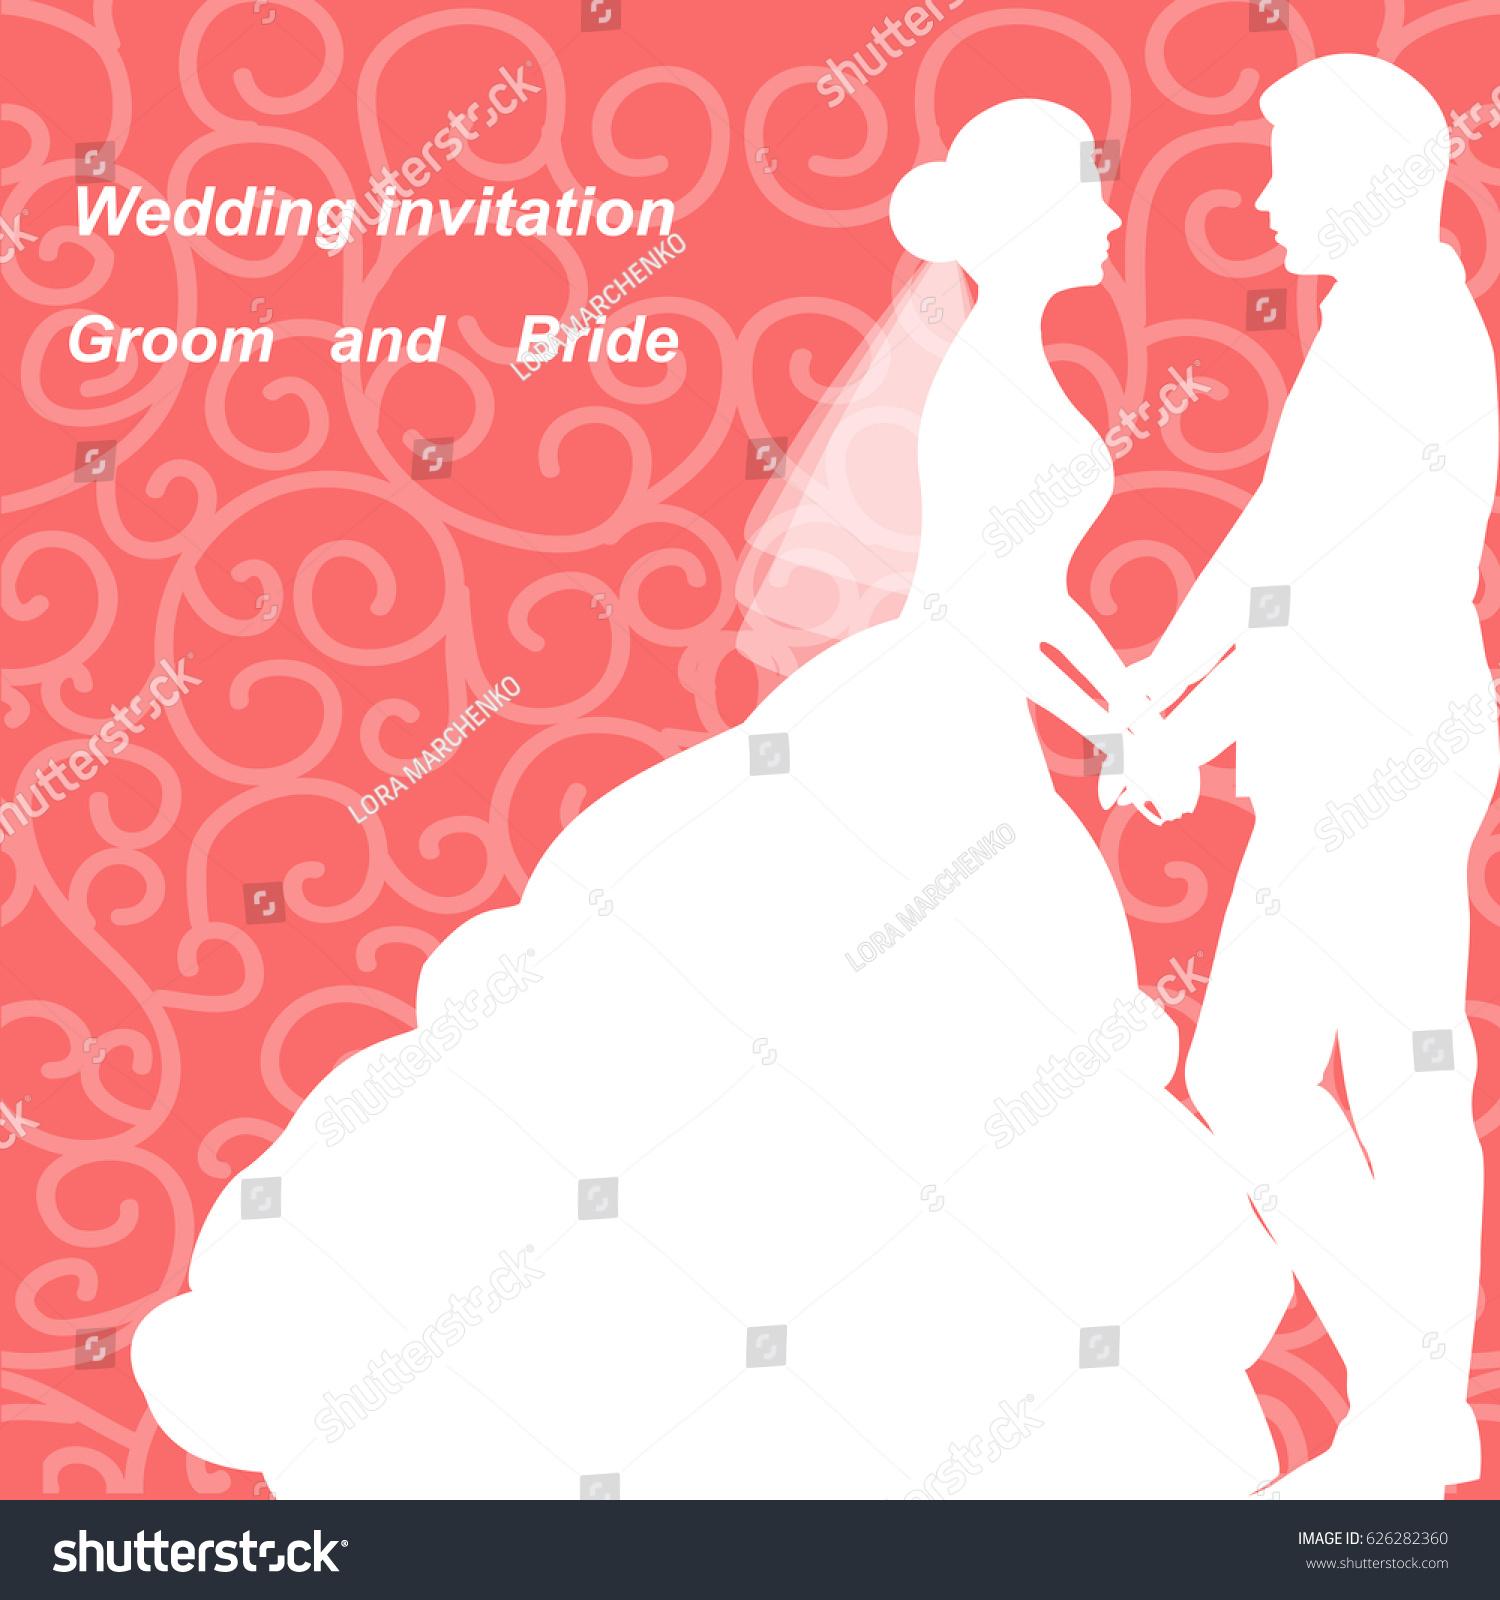 Wedding Invitation Bride Groom On Abstract Stock Vector (Royalty ...